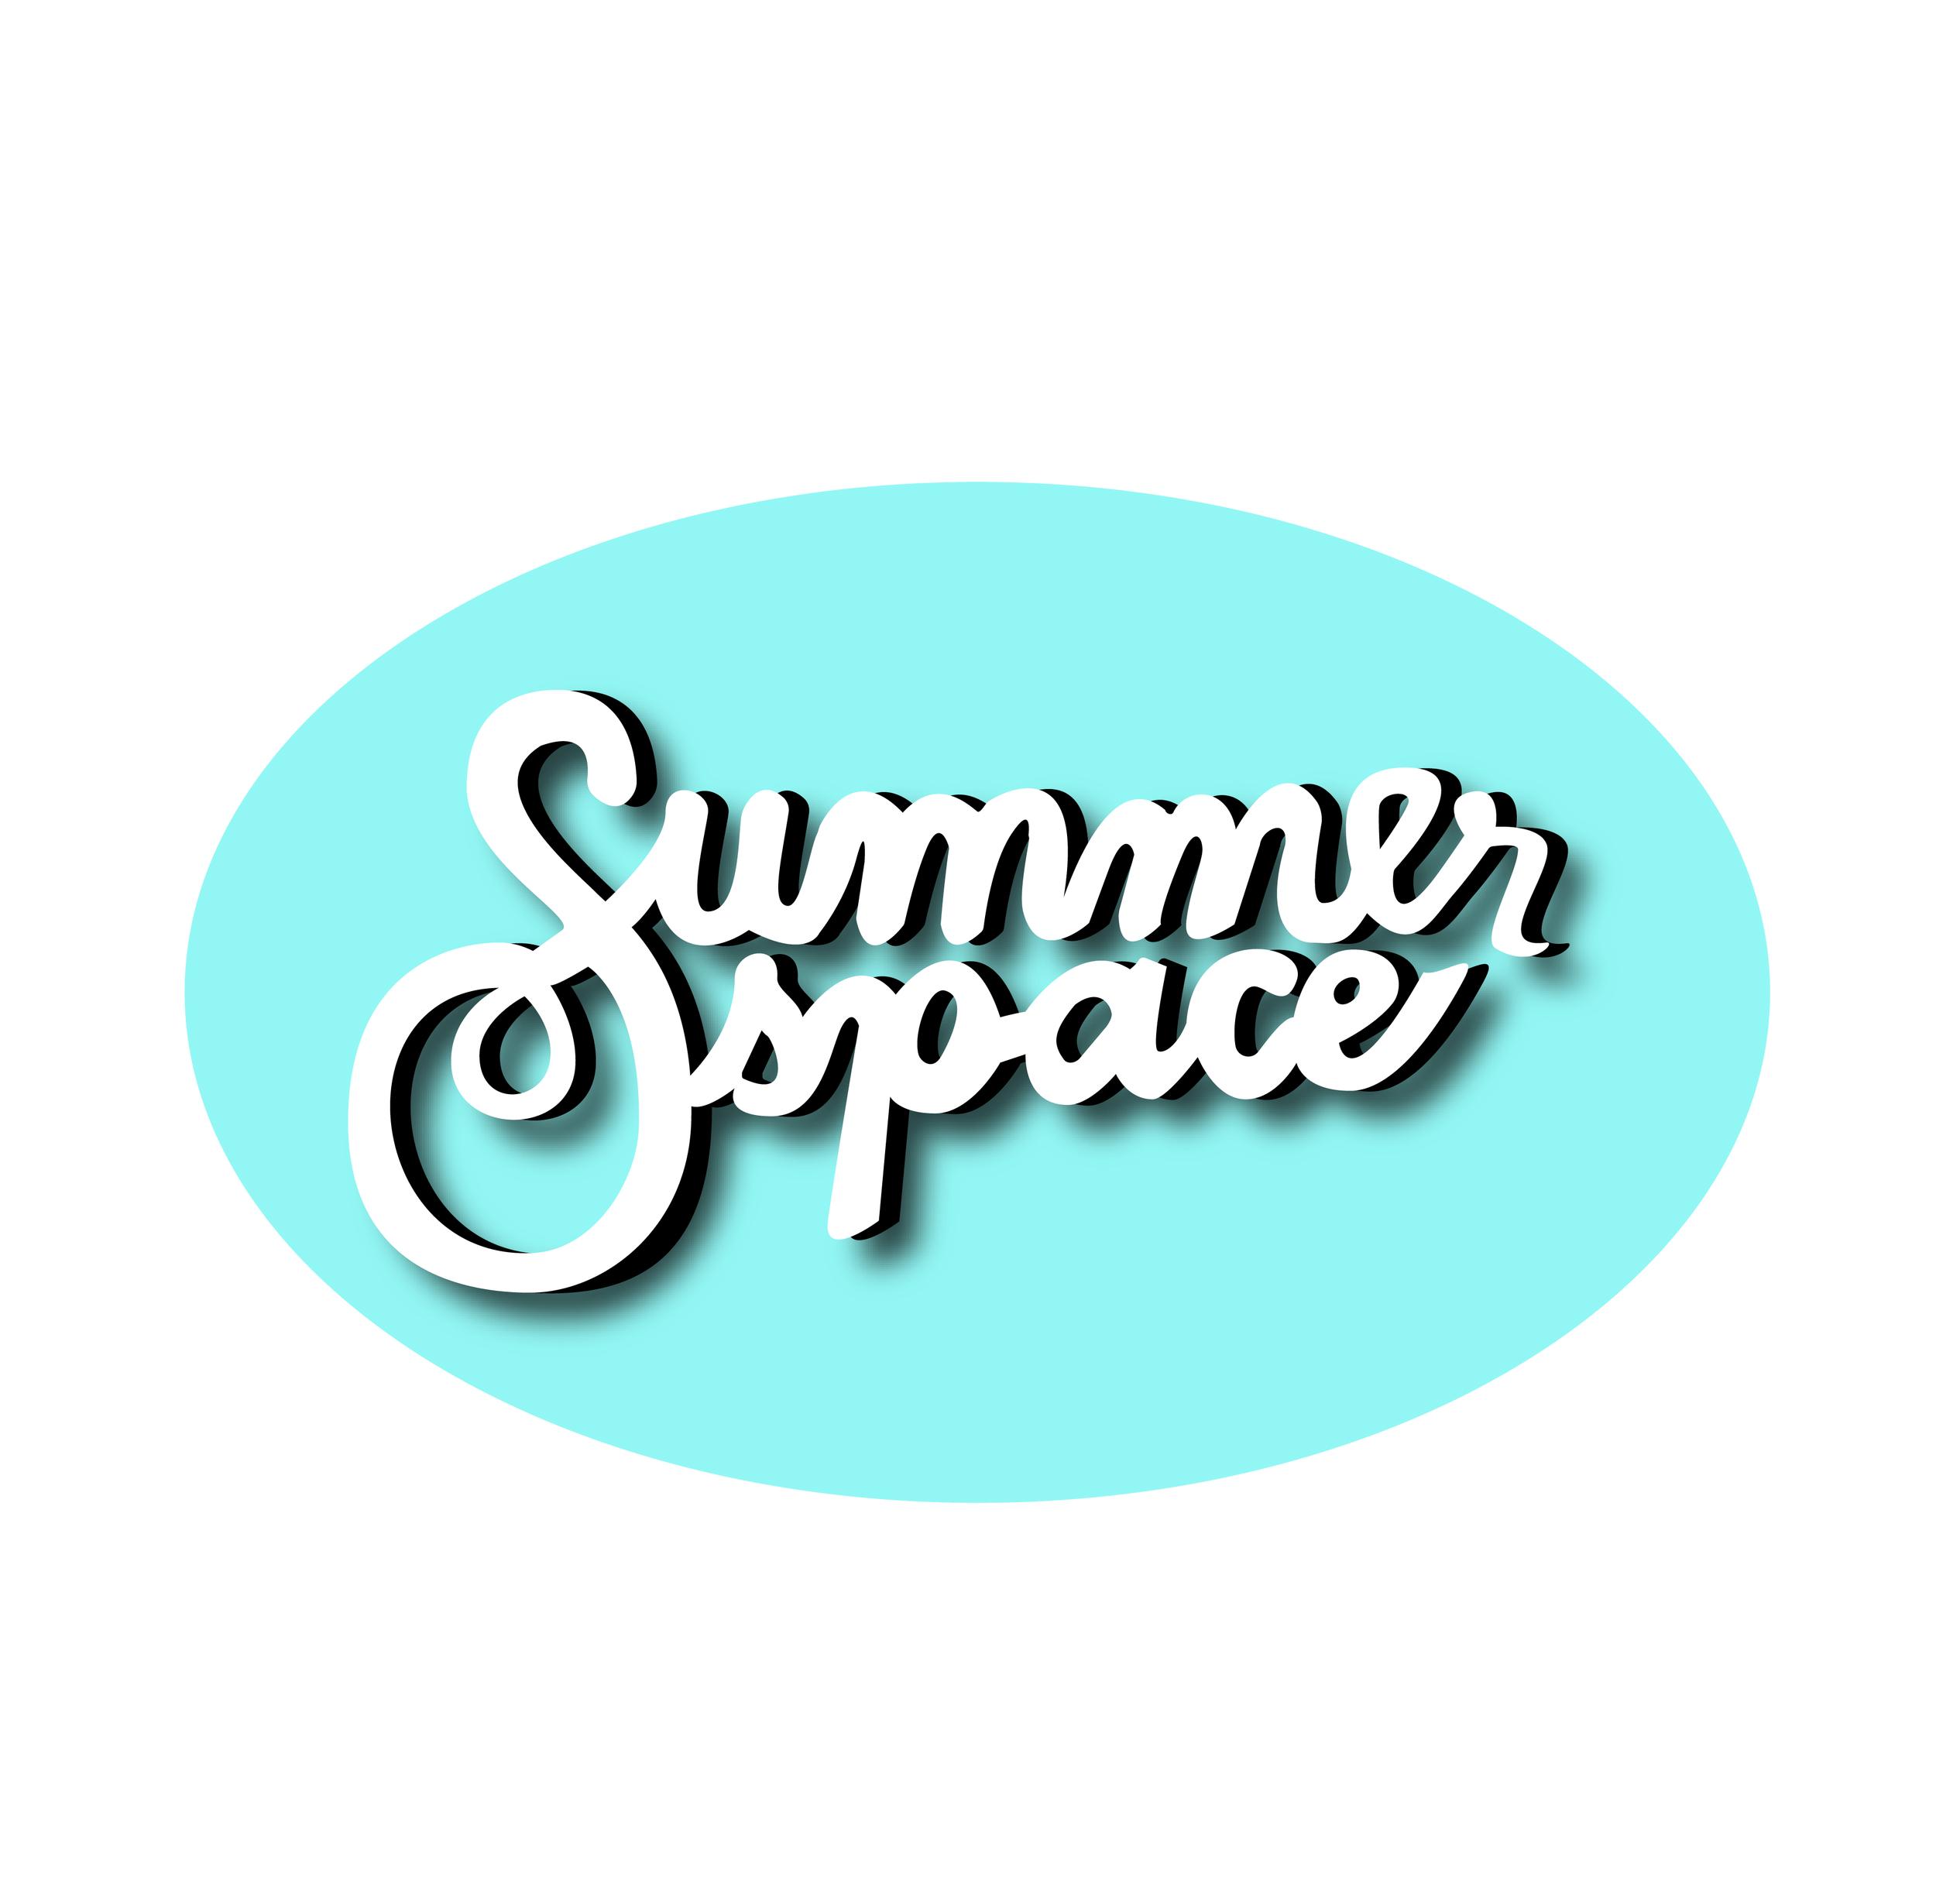 SS_logoprocess-05.png